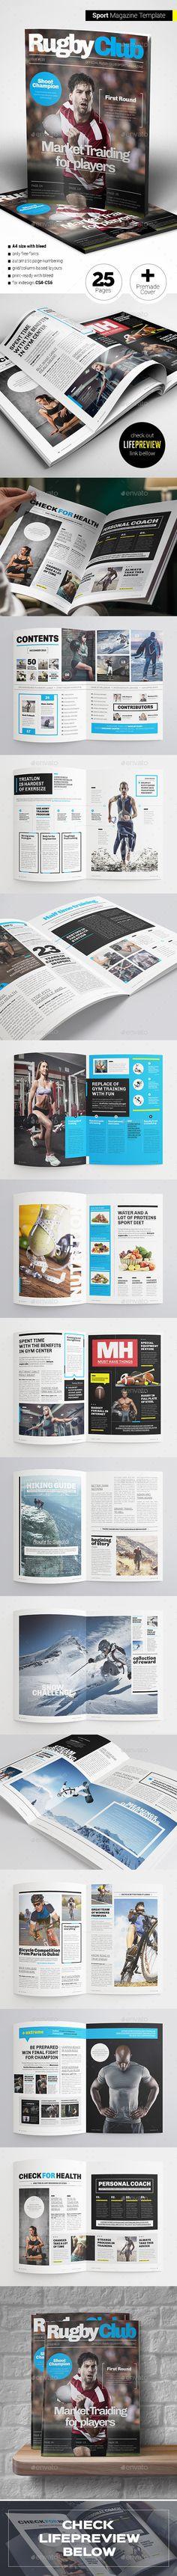 Sport Magazine Template InDesign INDD #design Download: http://graphicriver.net/item/sport-magazine/13883213?ref=ksioks